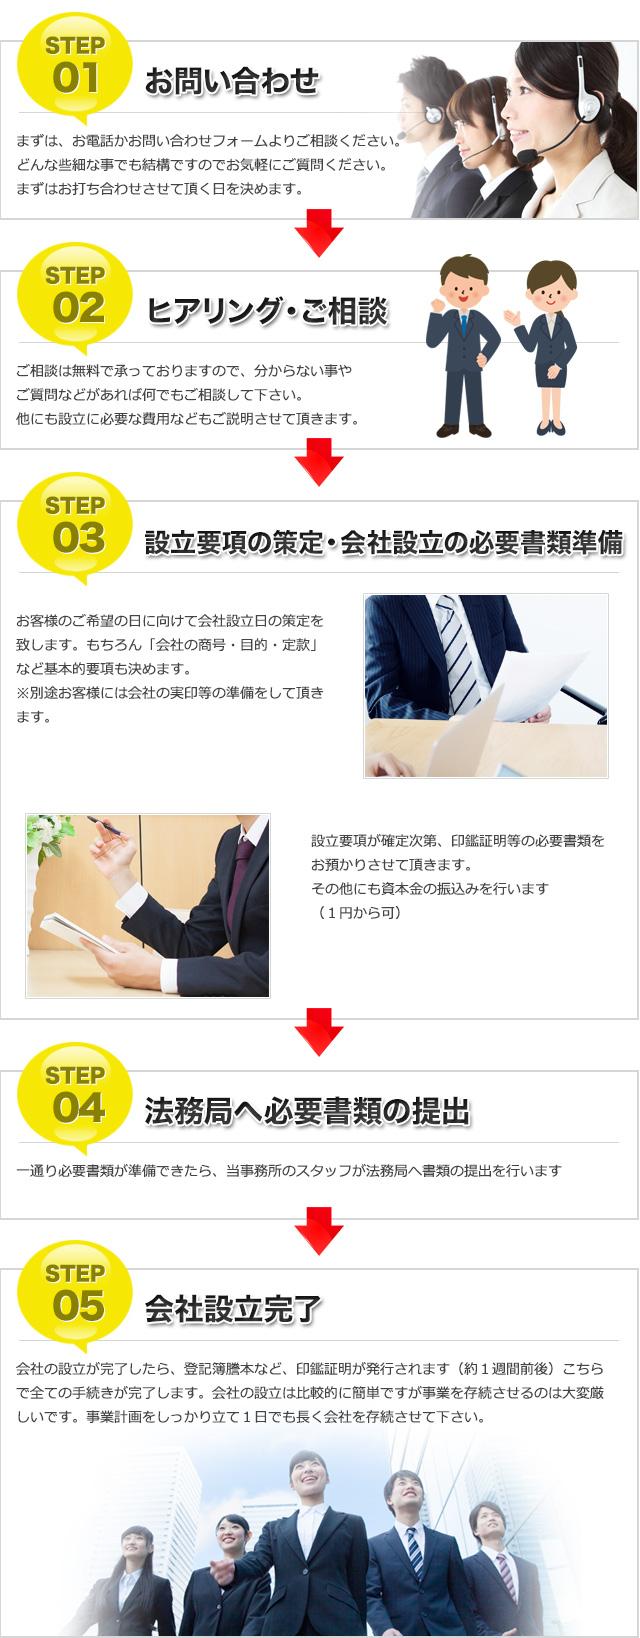 STEP1.お問い合わせ/STEP2.ヒアリング・ご相談/STEP3.設立要綱の策定・会社設立の必要書類準備/STEP4.法務局へ必要書類の提出/STEP5.会社設立完了